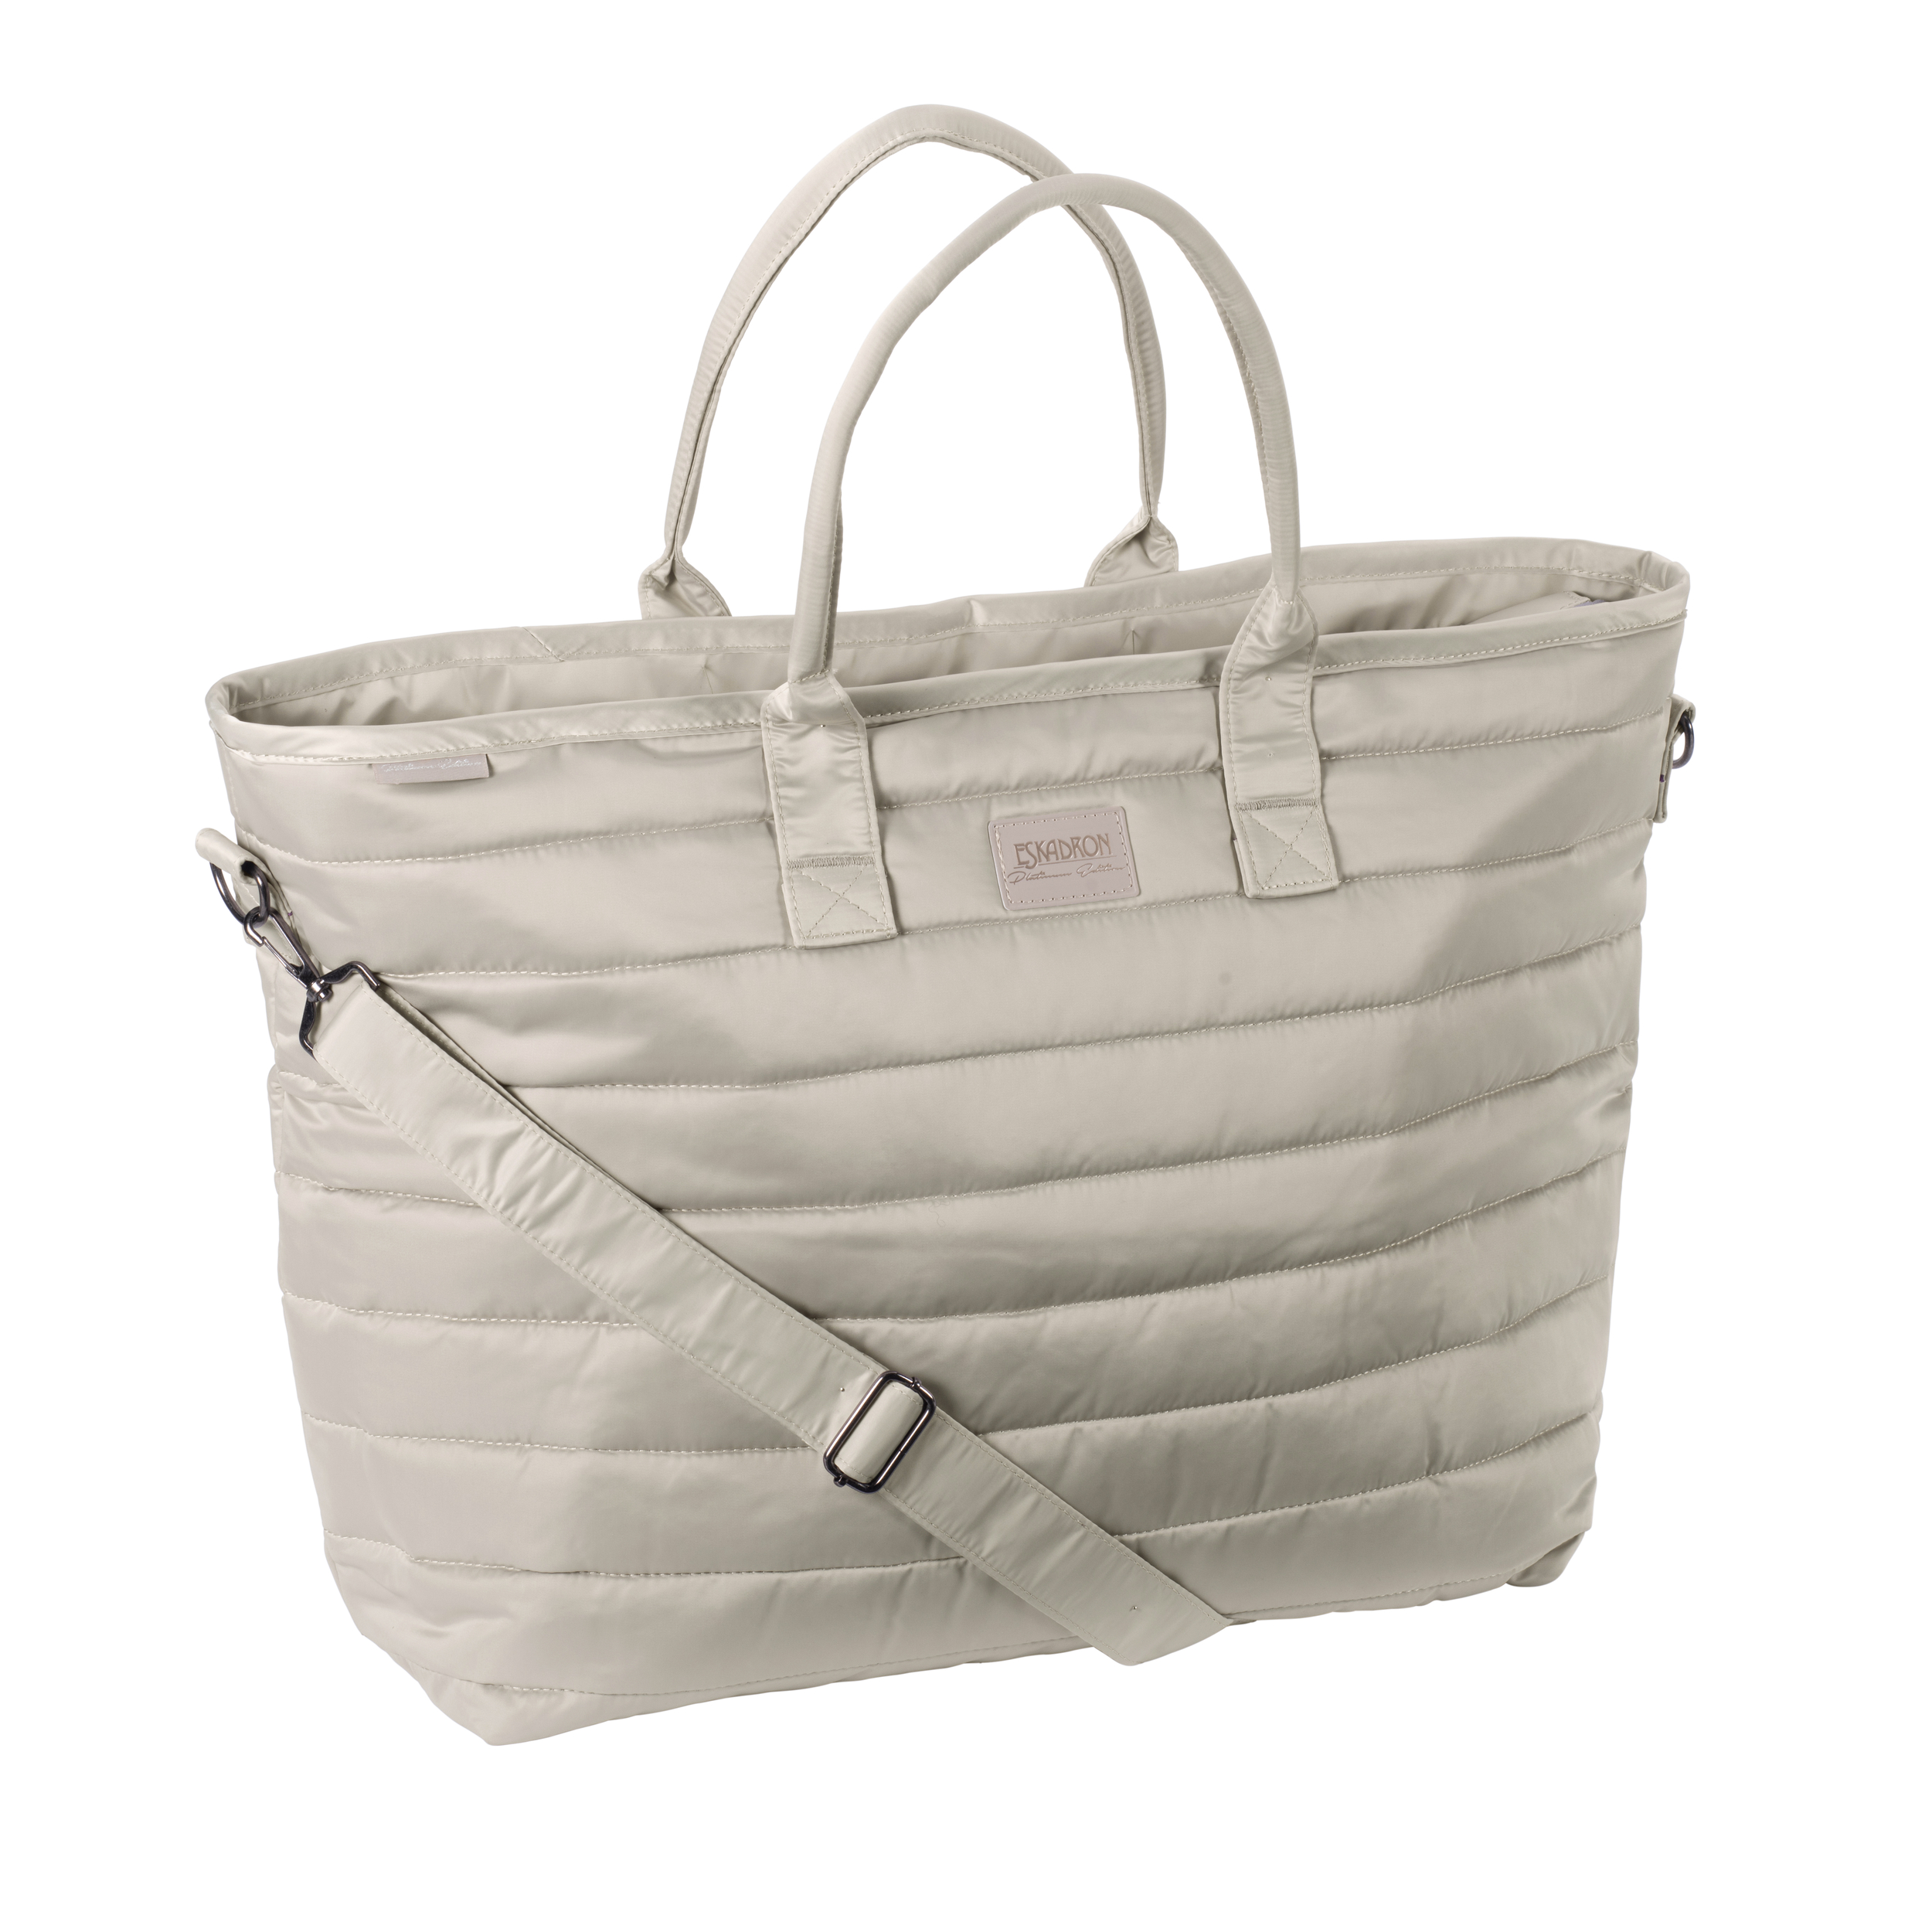 Eskadron Shopper Bag Glossy Platinum 20/21